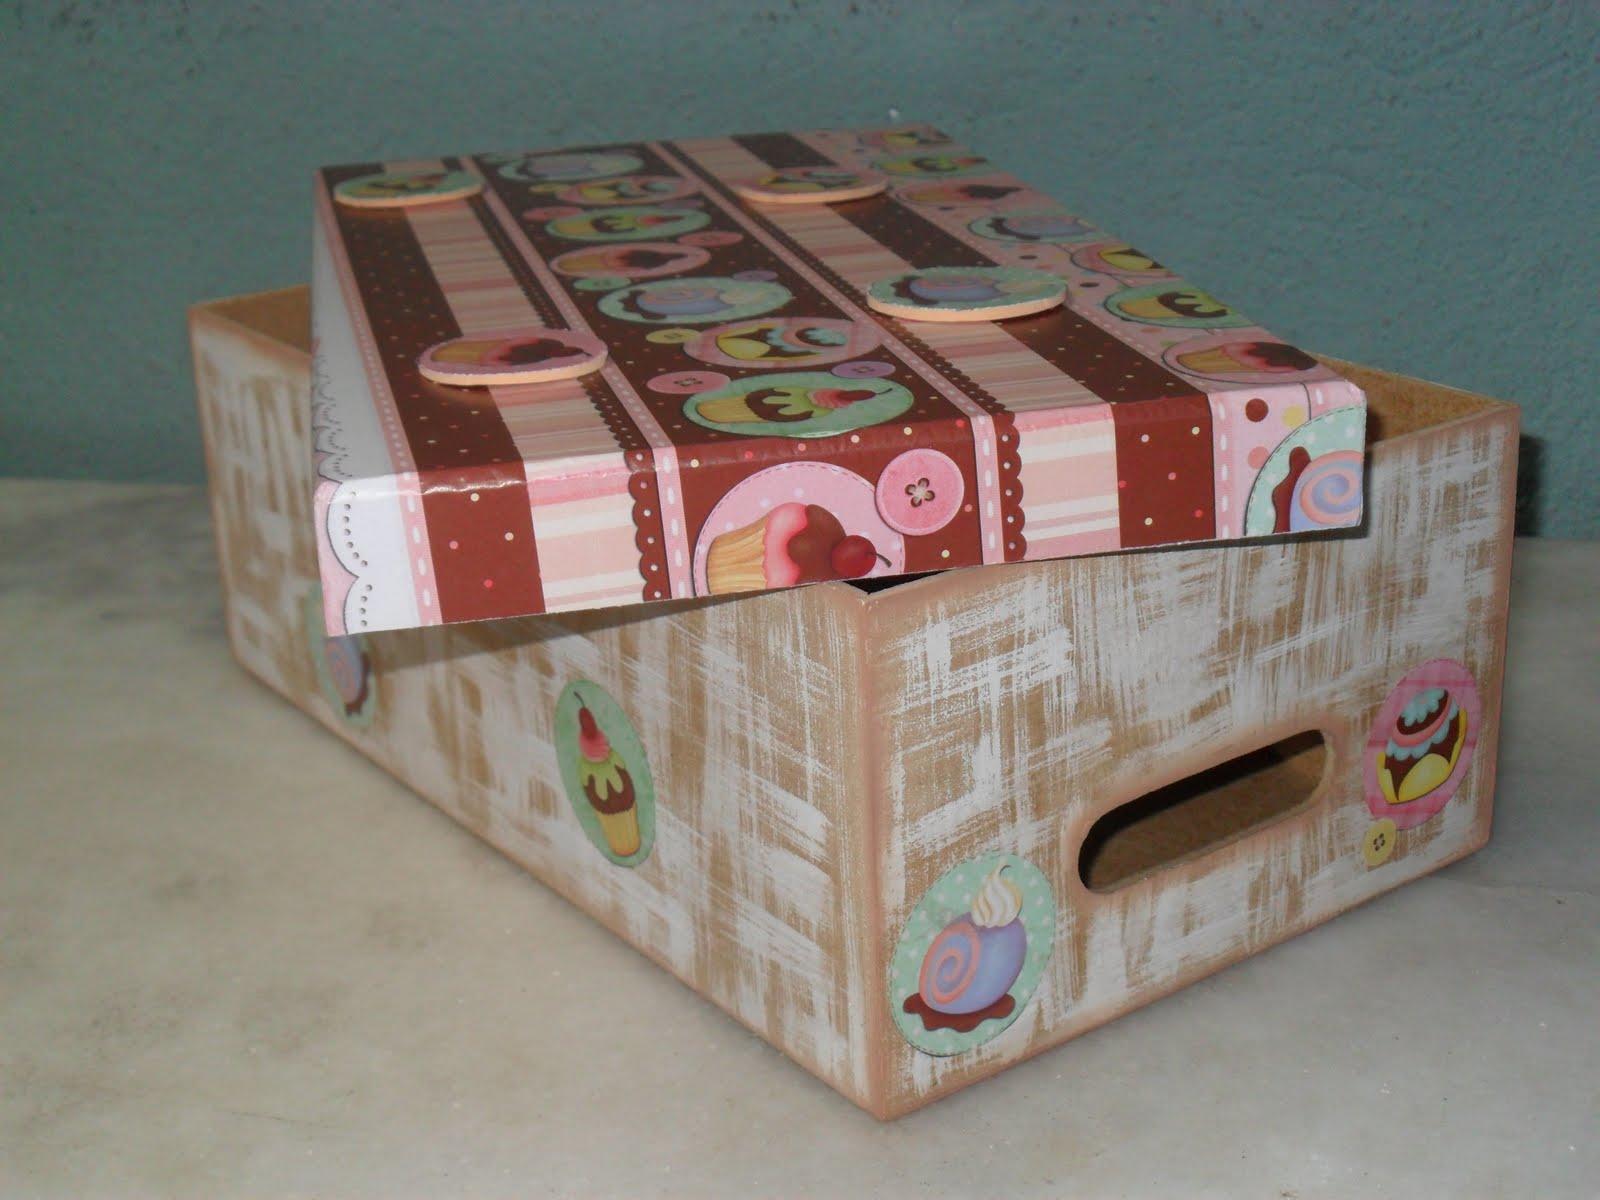 Emanuelle Rosa Biscuit: Caixas de madeira decoradas II #764136 1600x1200